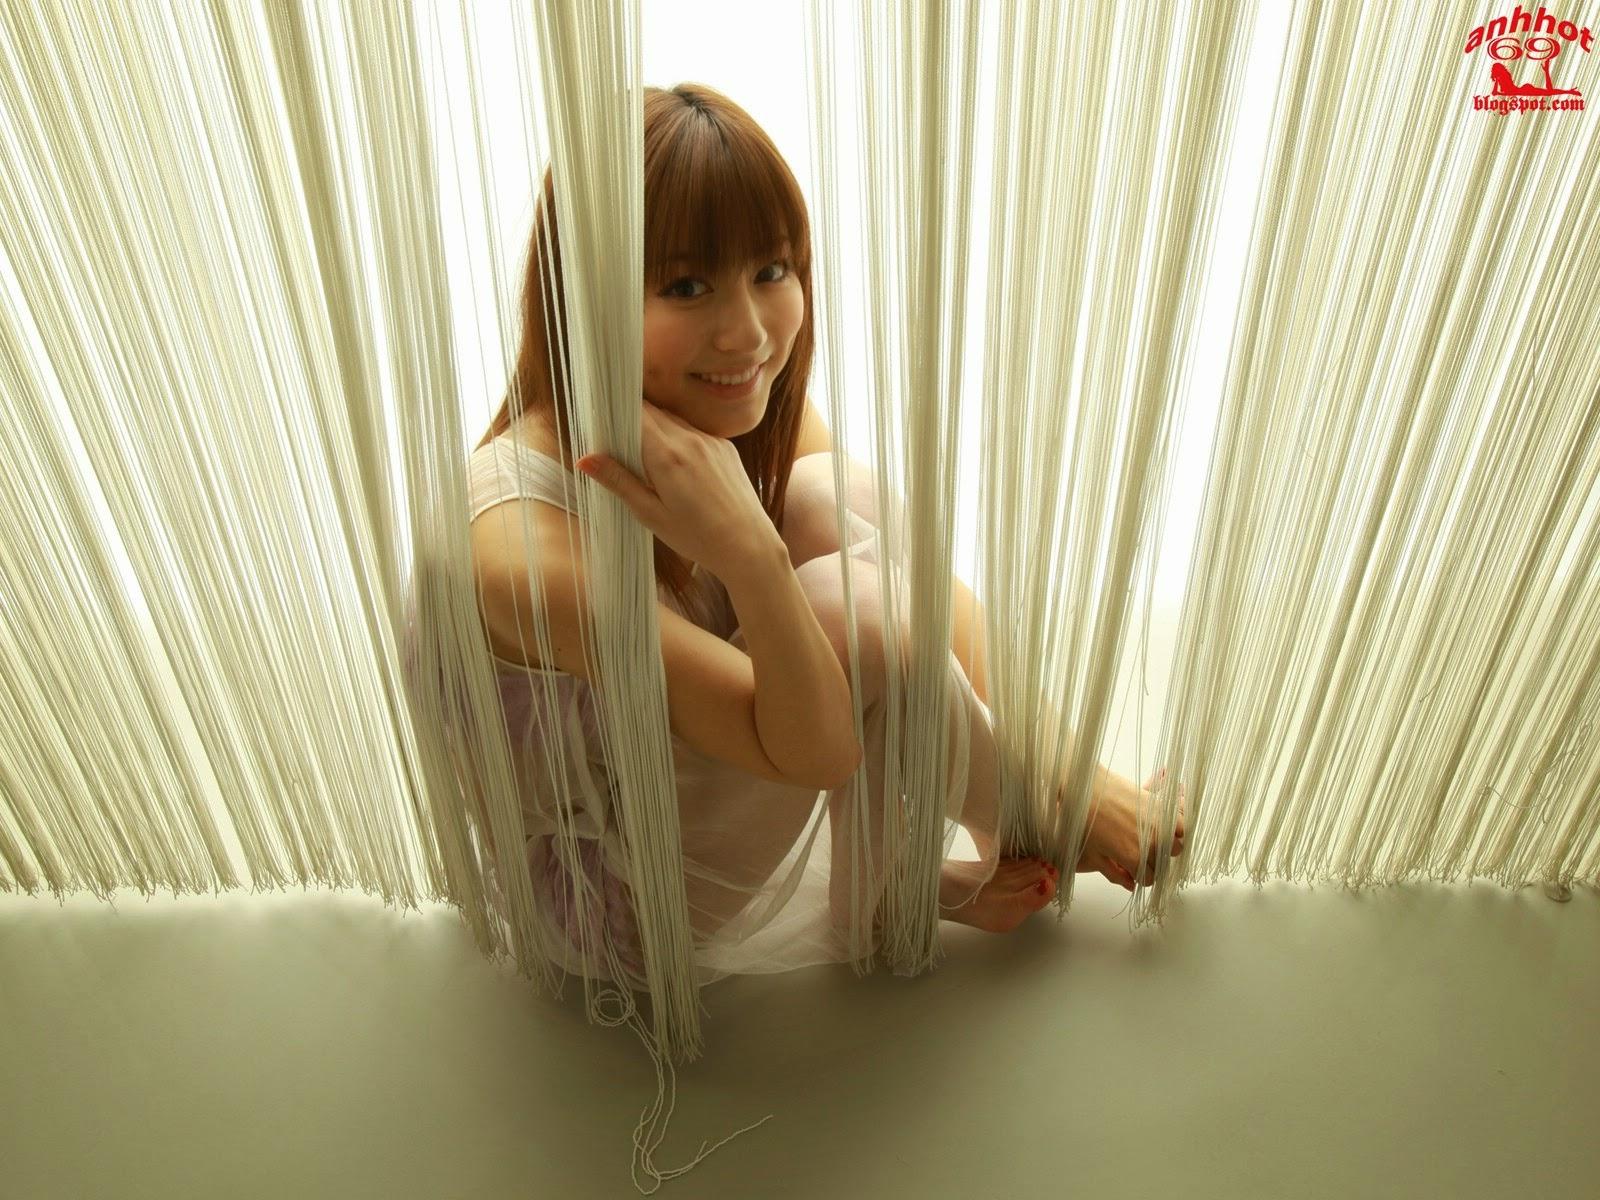 yumi-sugimoto-00494451